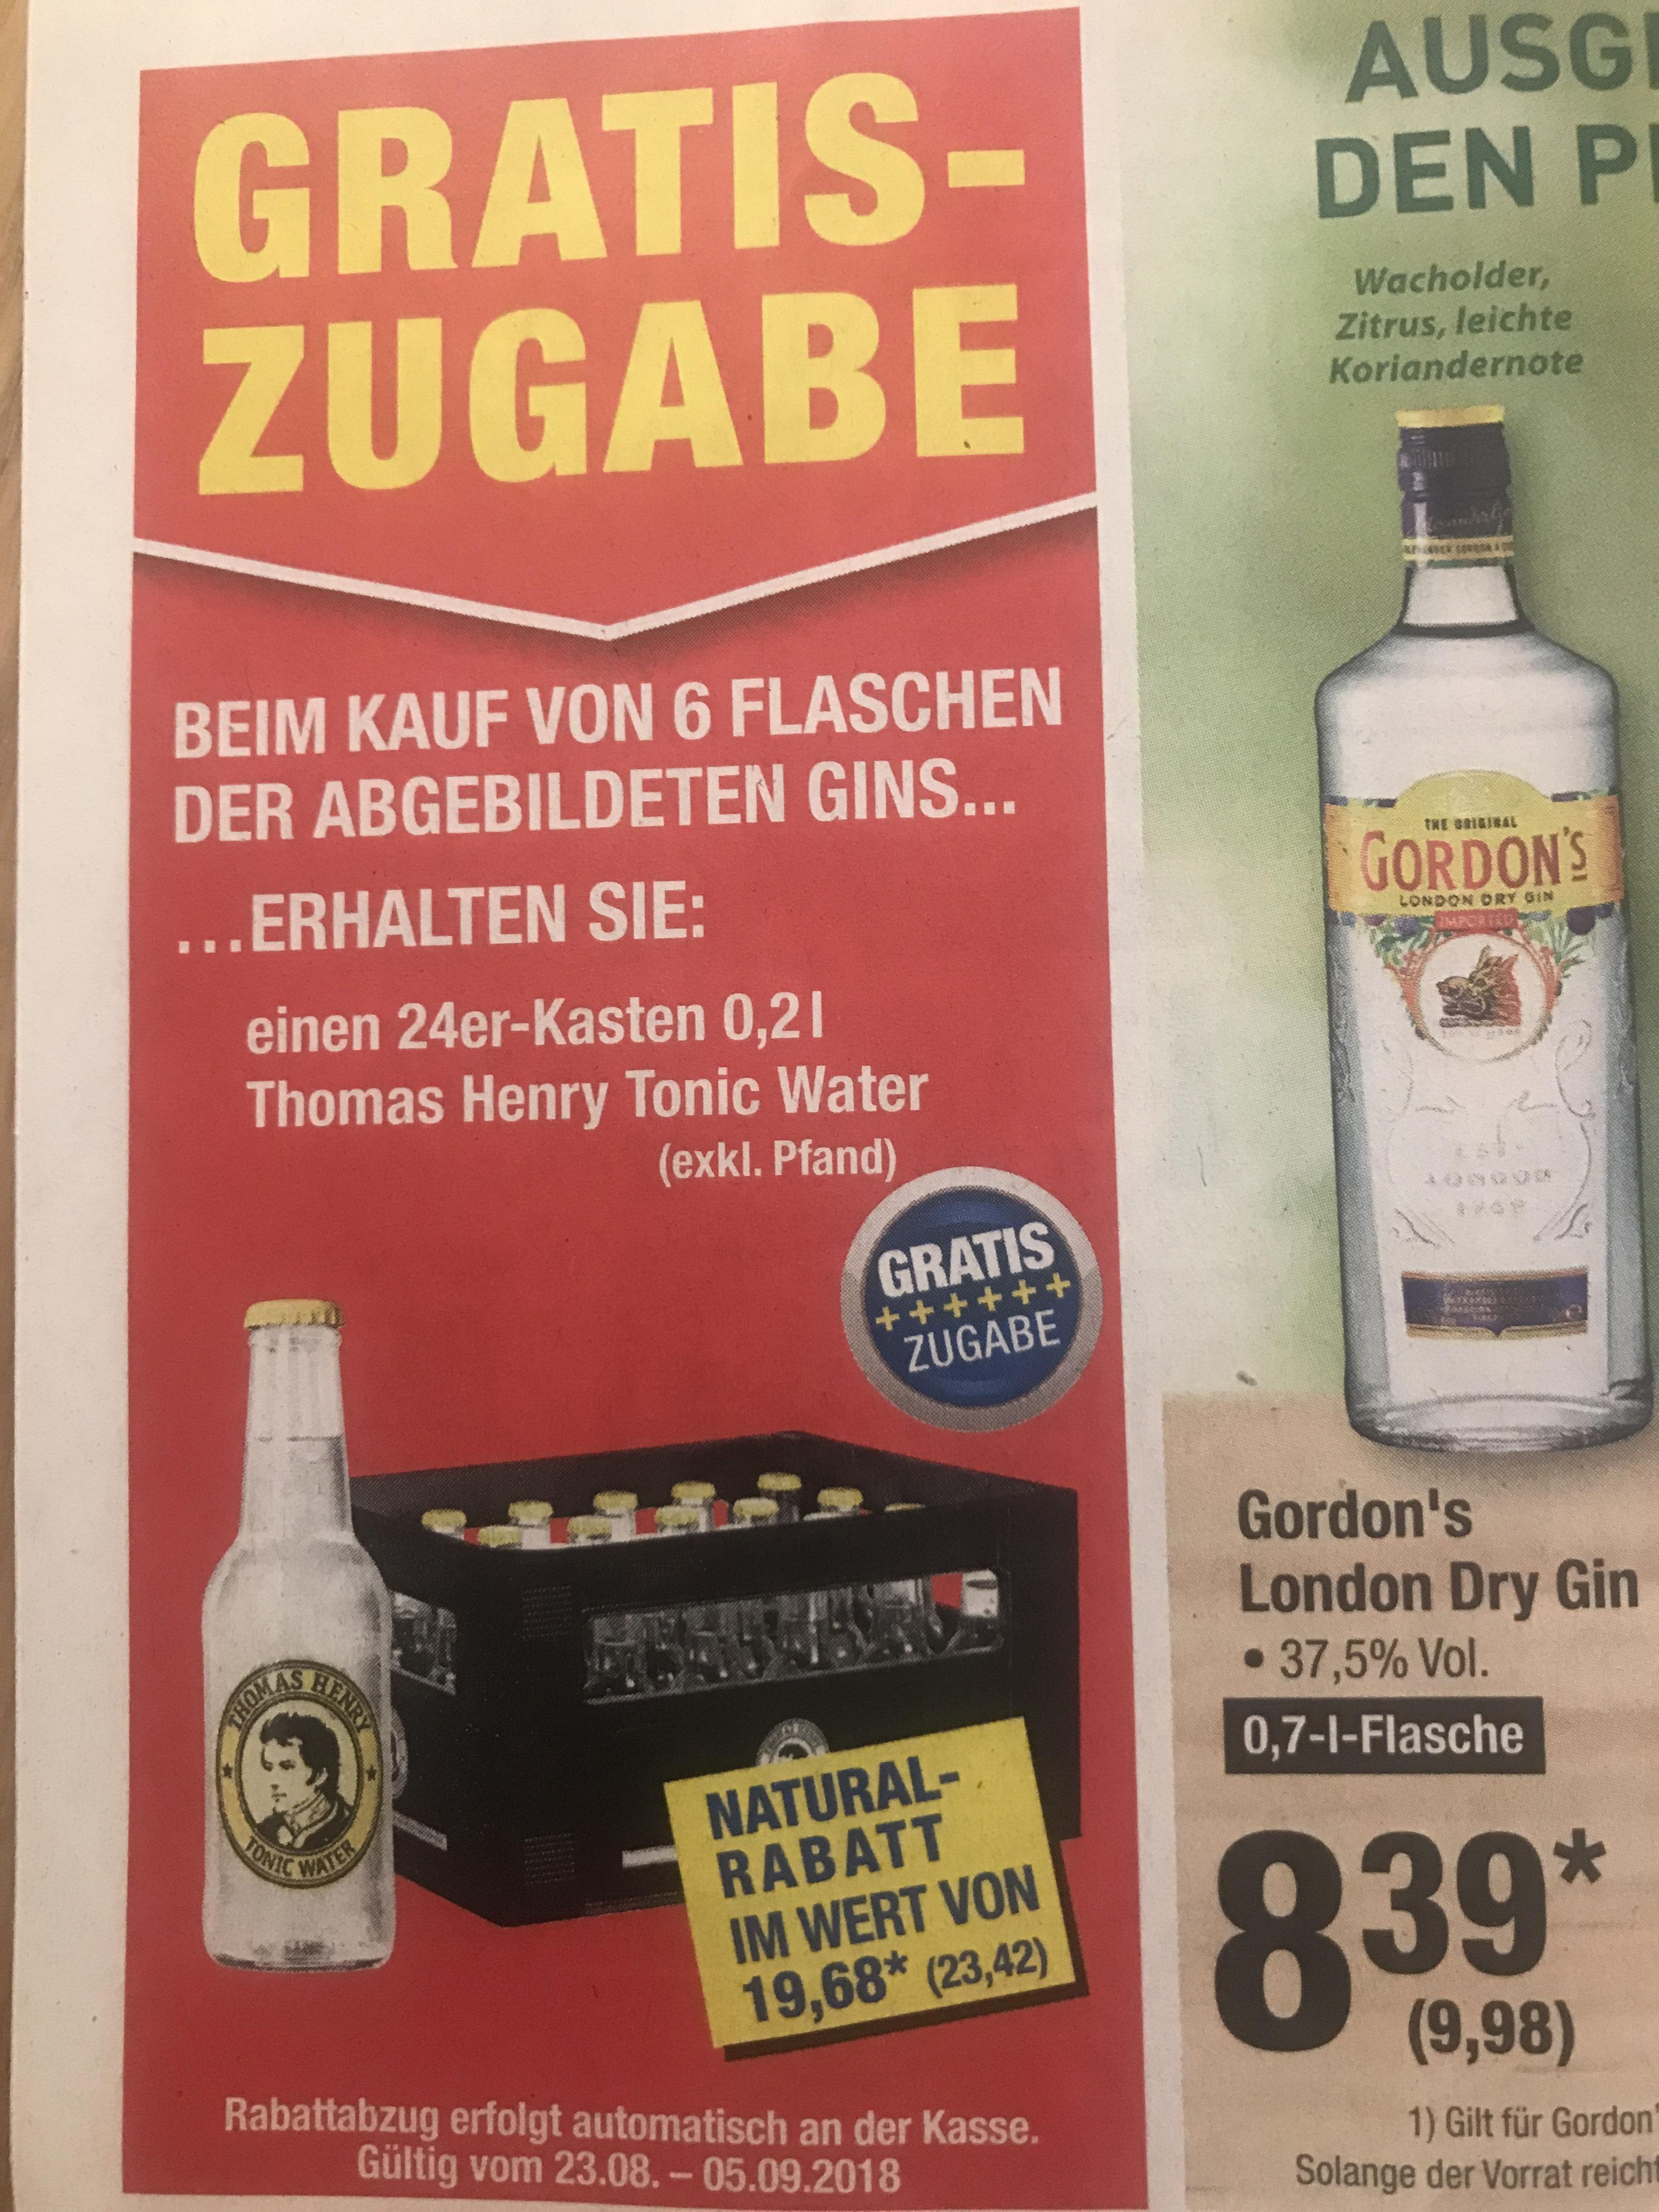 [Metro] 6x Gordon's London Dry Gin + Kasten(24x0,2) Thomas Henry Tonic für 59,88 € + Pfand 4,64€